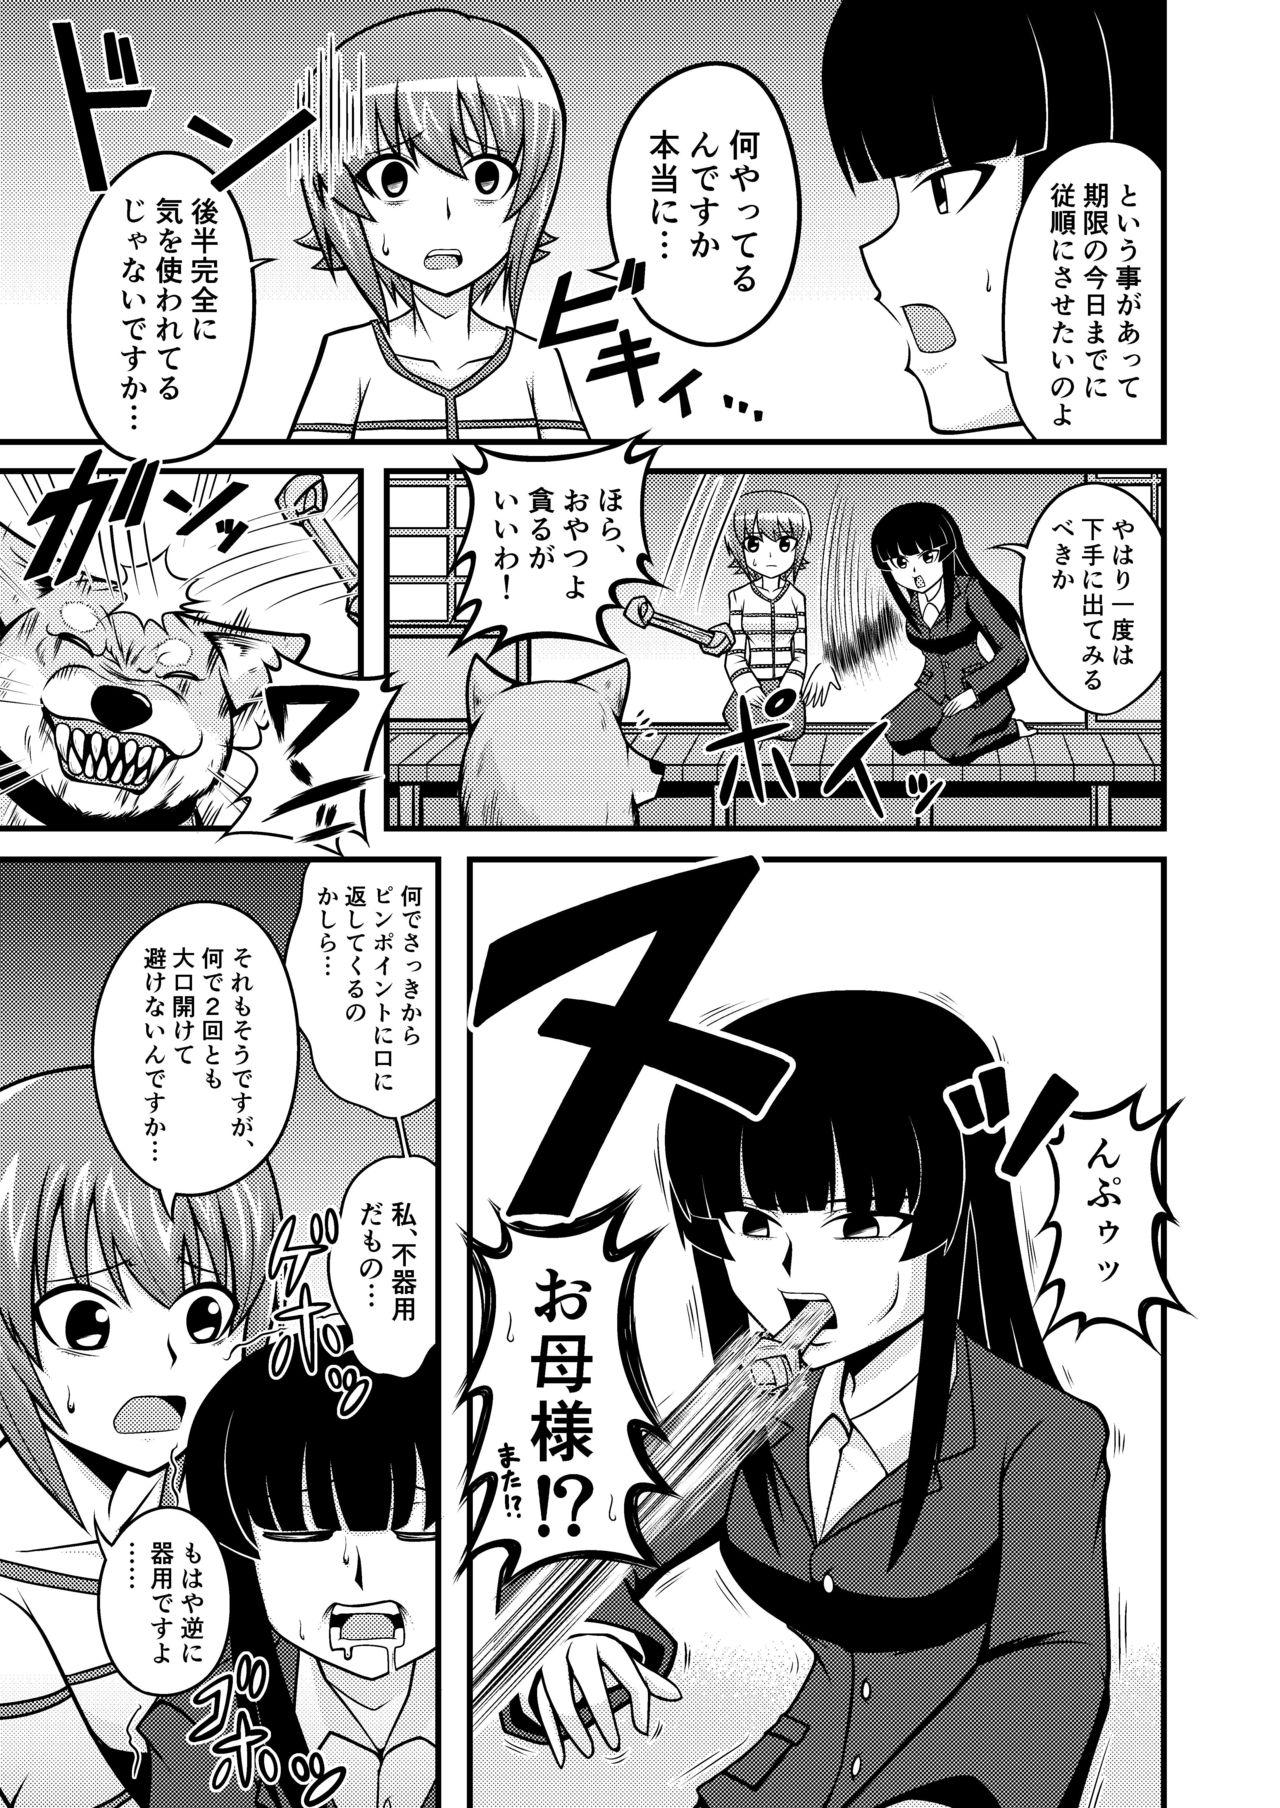 Garupan Iemoto Manga 『Iemoto no Inu』 4